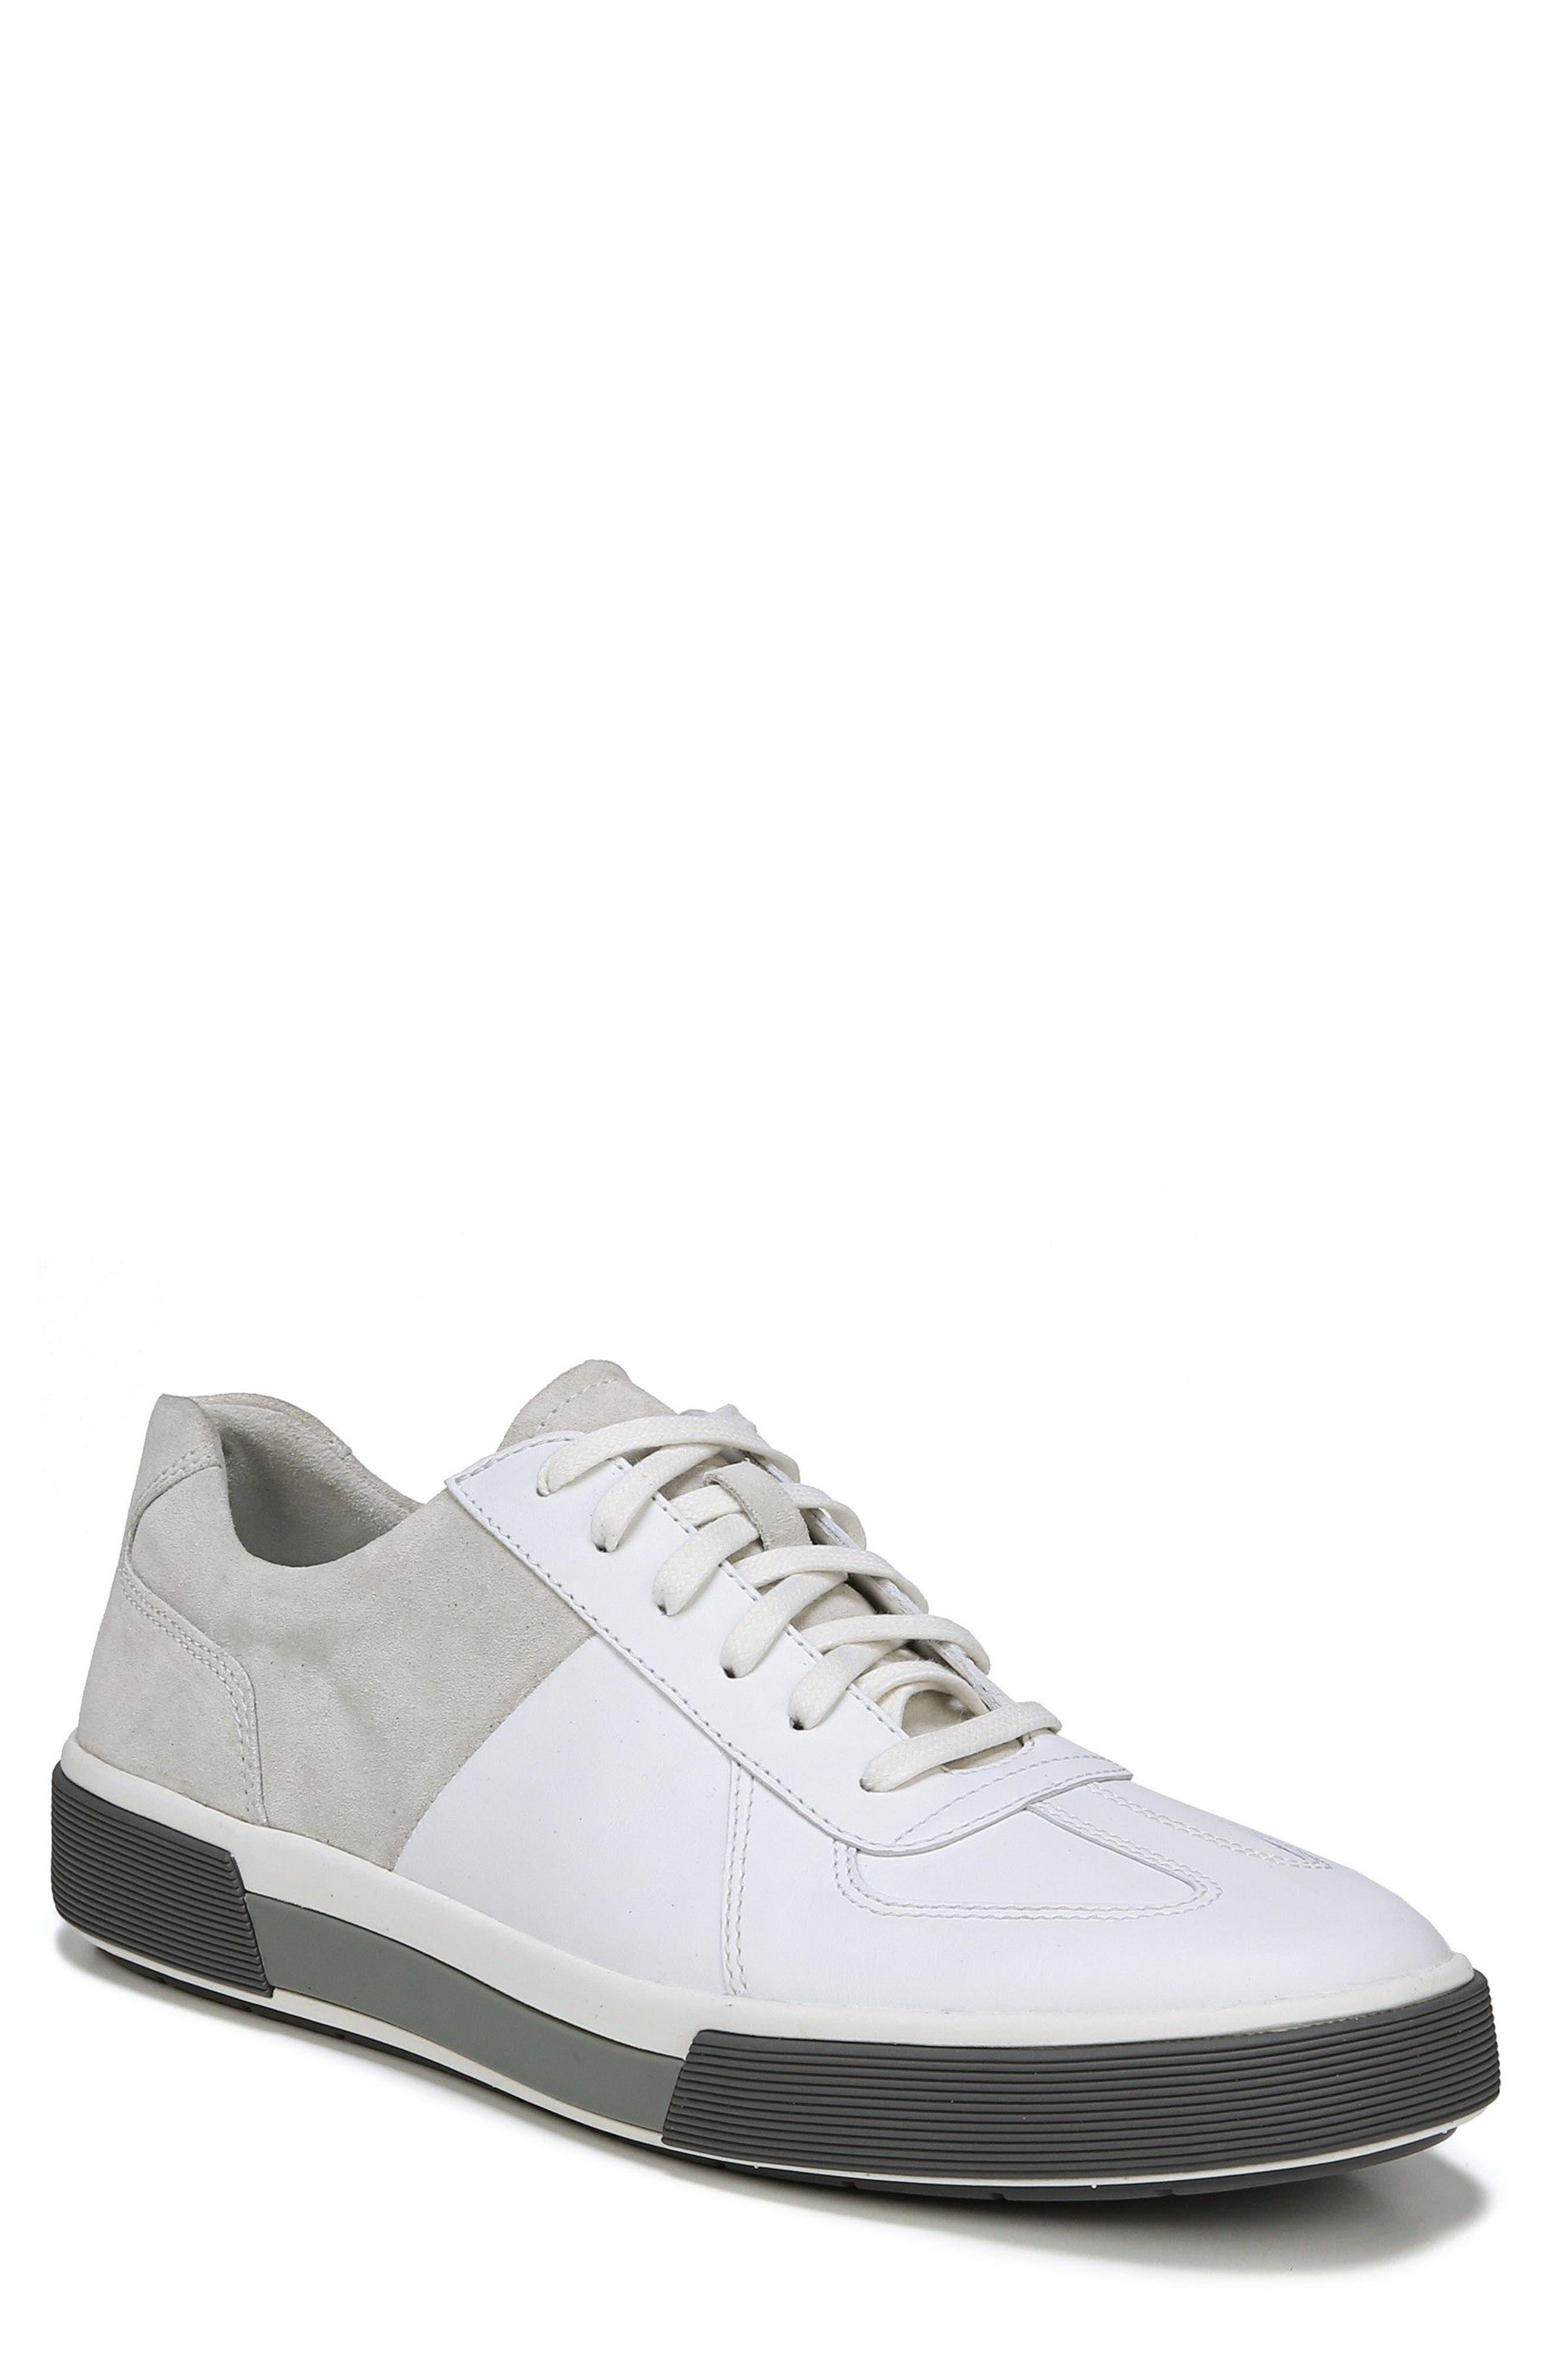 VINCE, Rogue Low Top Sneaker, Main thumbnail 1, color, WHITE/ HORCHATA